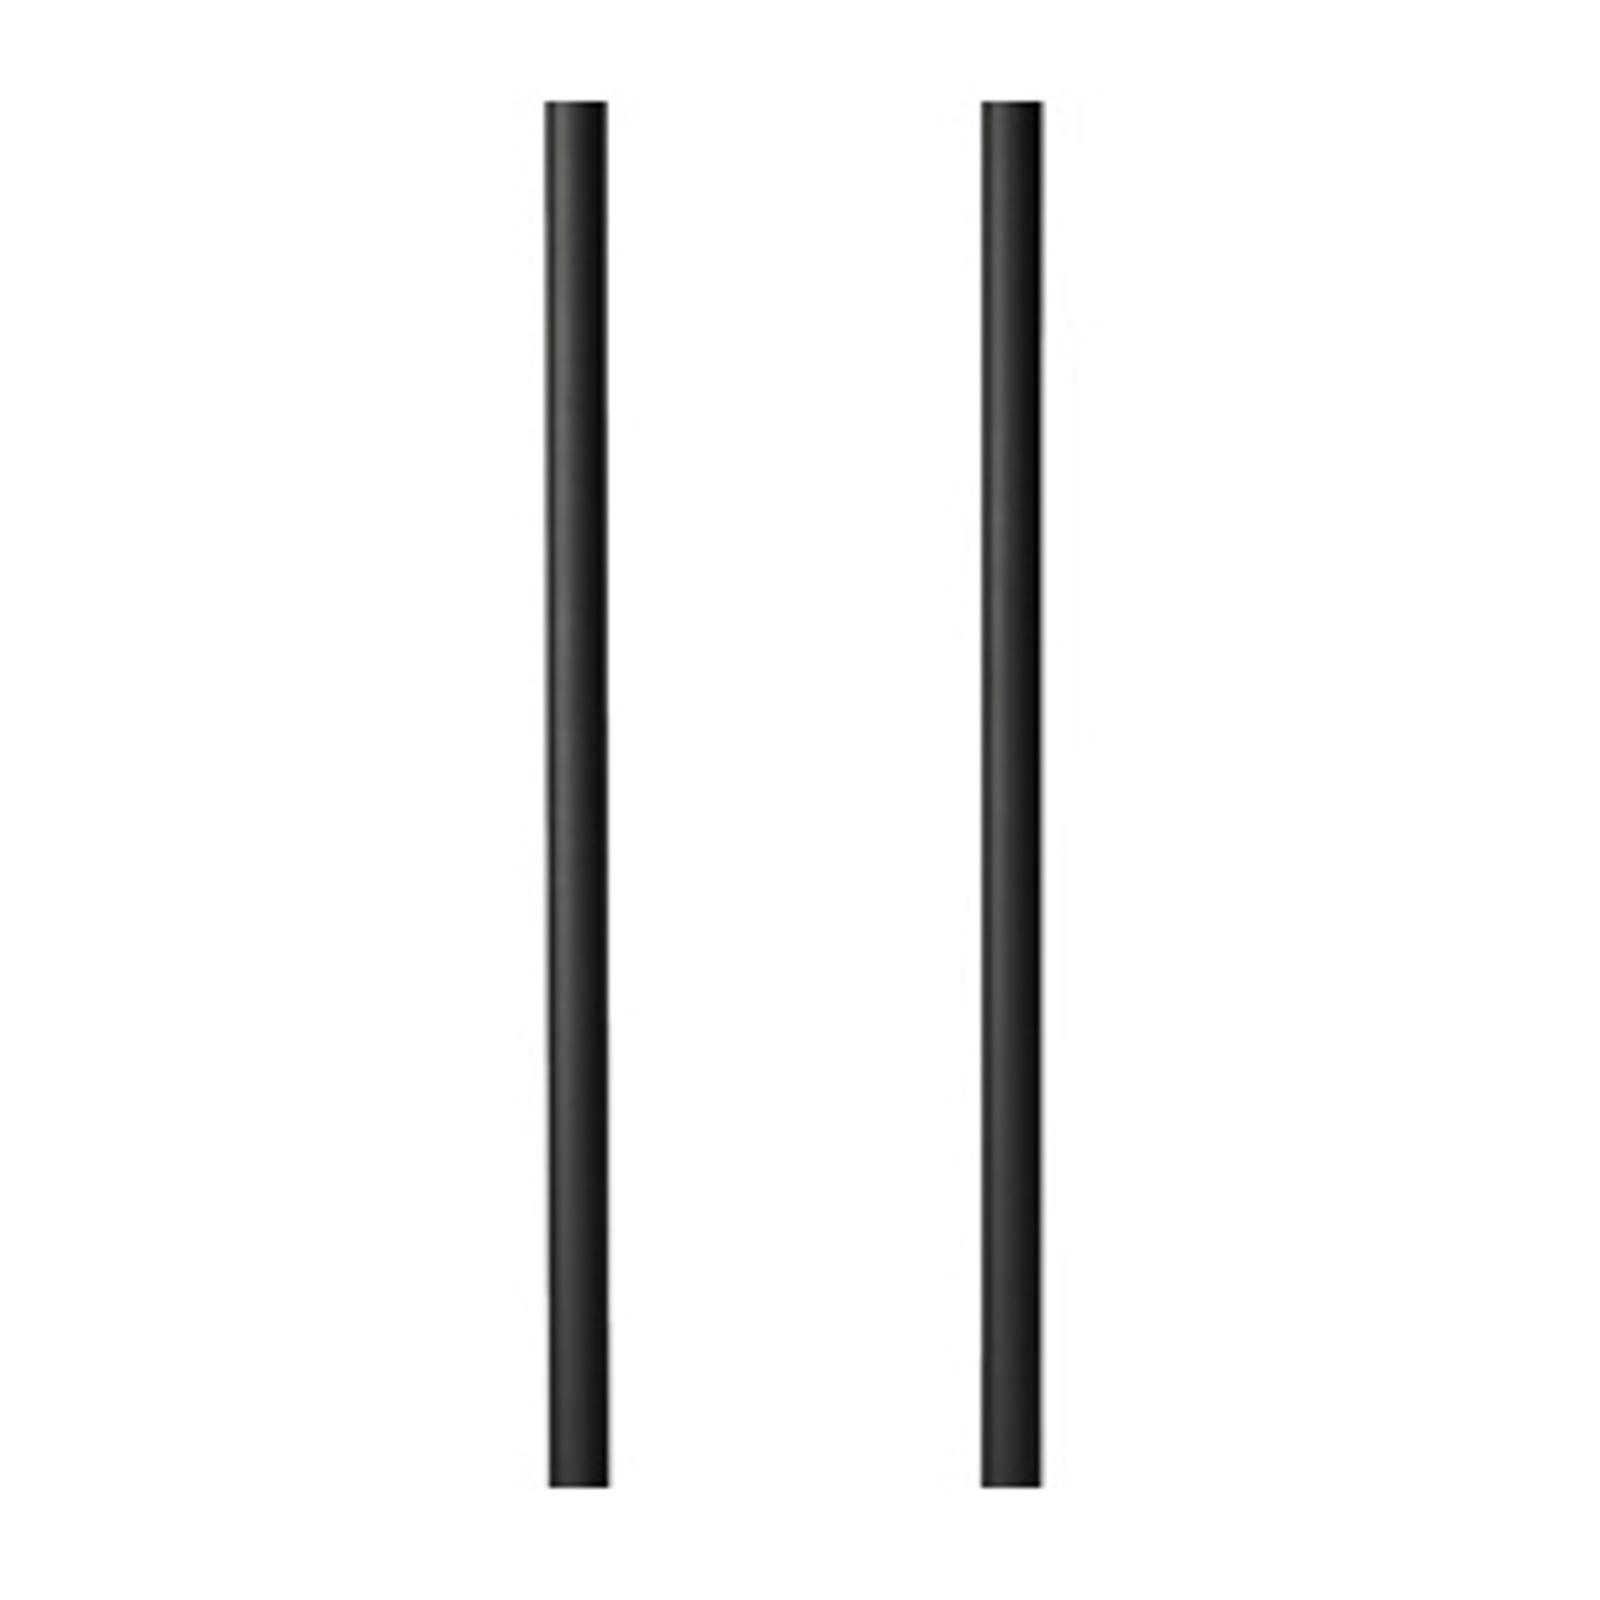 Postkassestativ Stand 1005, svart